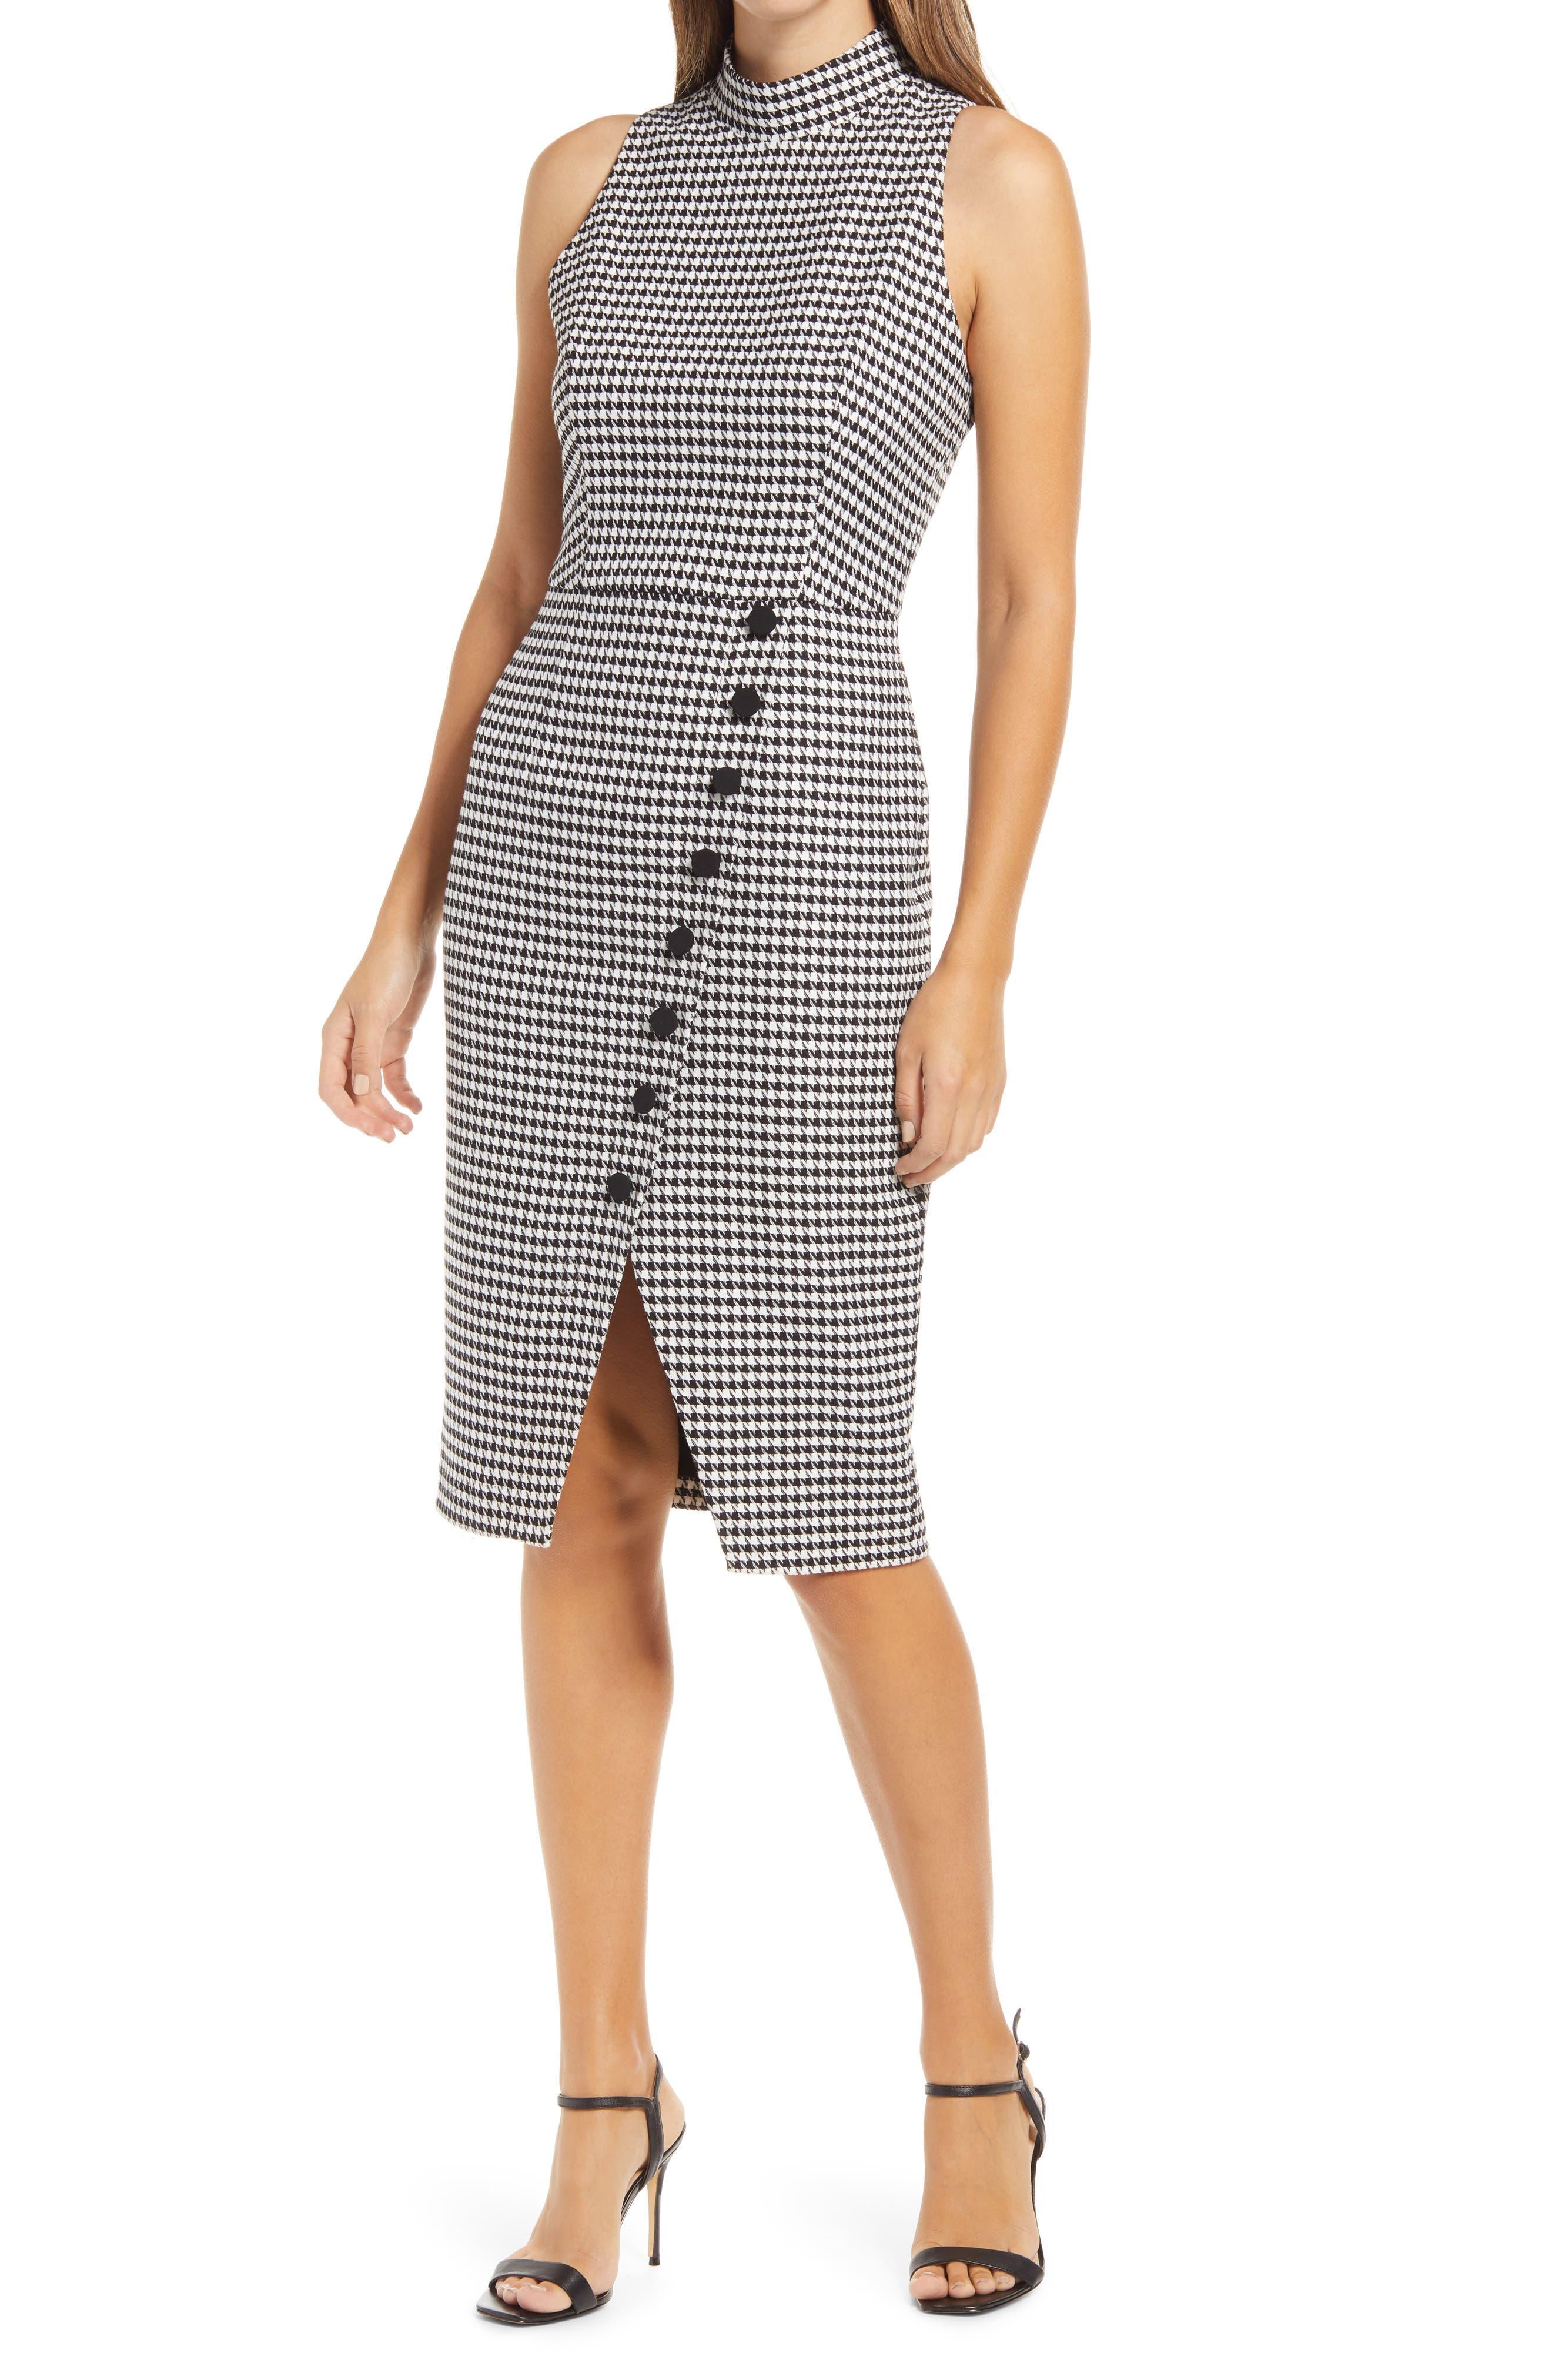 Sofie Sleeveless Sheath Dress